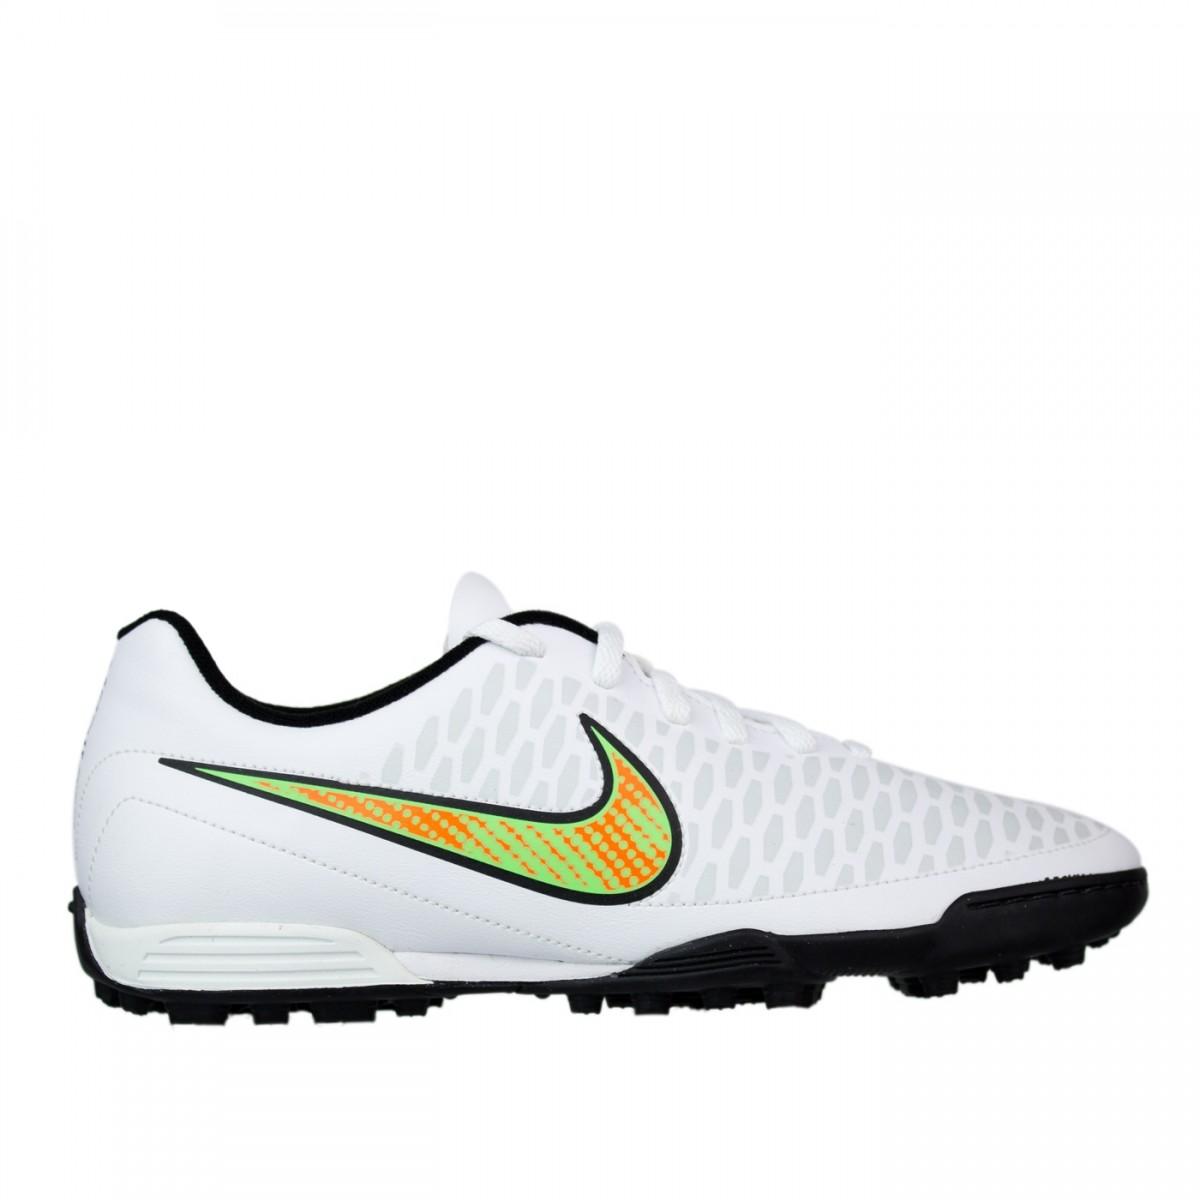 b546dba8b4a43 Bizz Store - Chuteira Para Society Nike Magista Masculina 651548